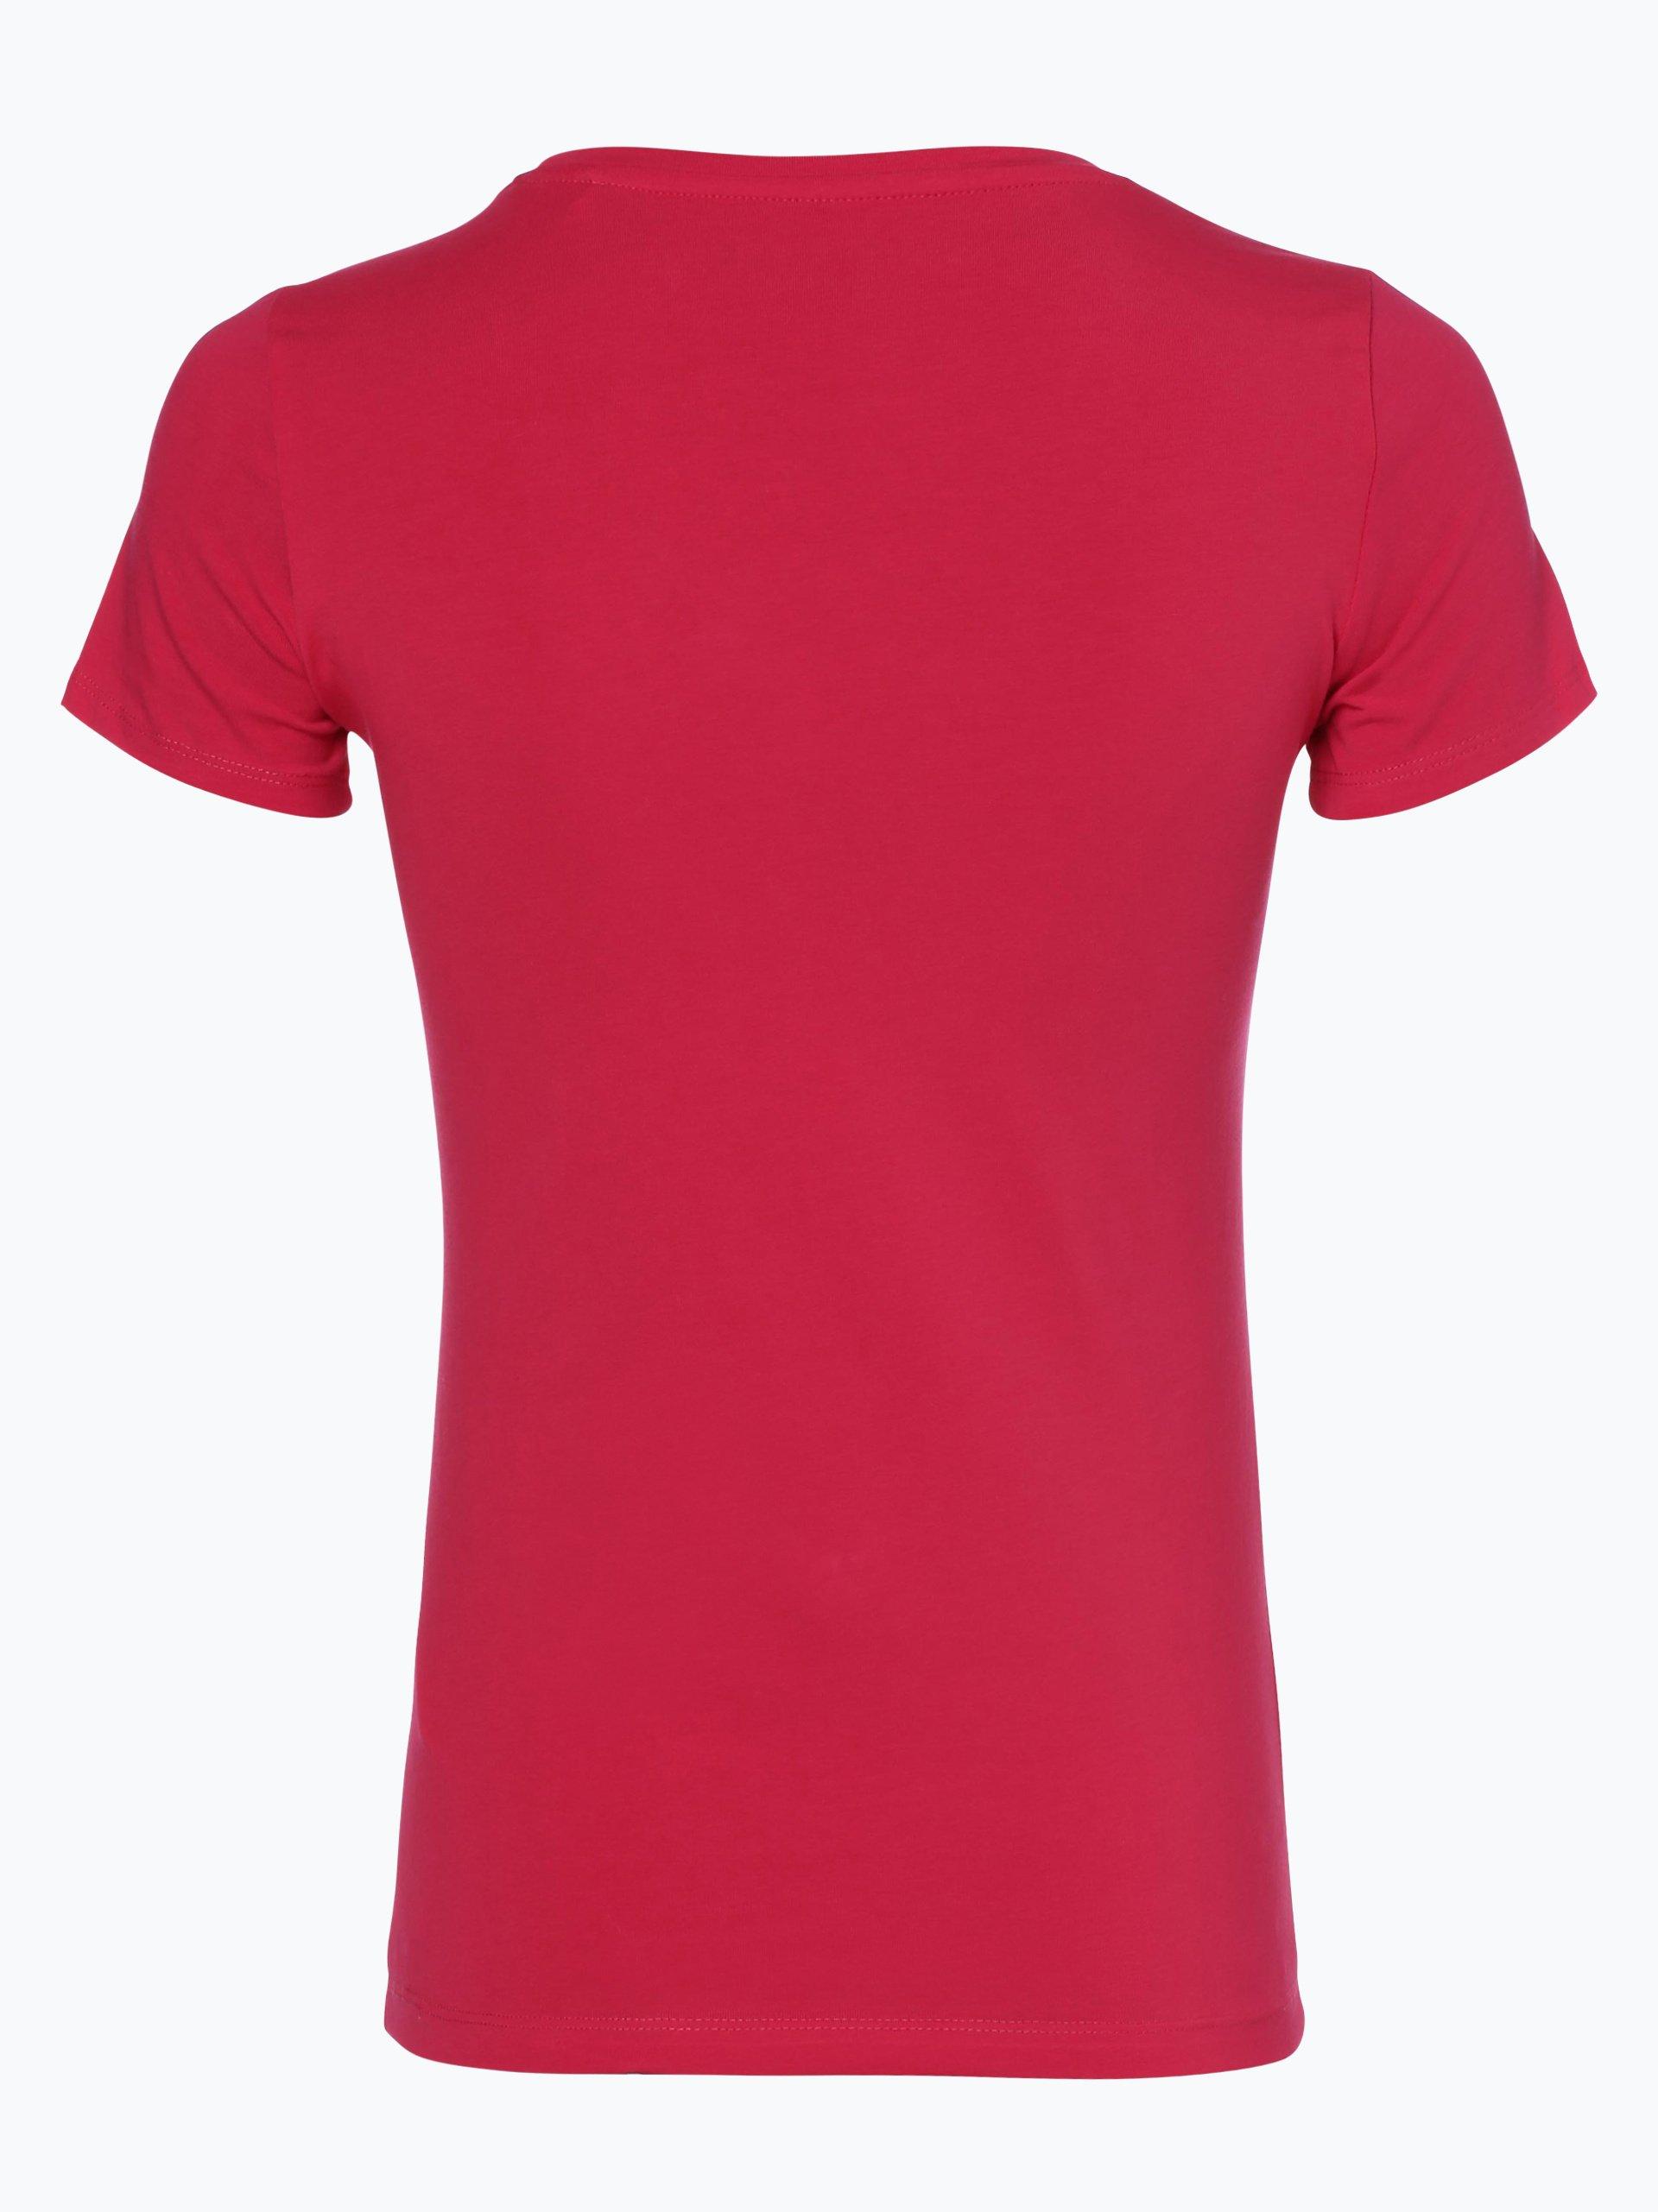 guess jeans damen t shirt pink gemustert online kaufen. Black Bedroom Furniture Sets. Home Design Ideas